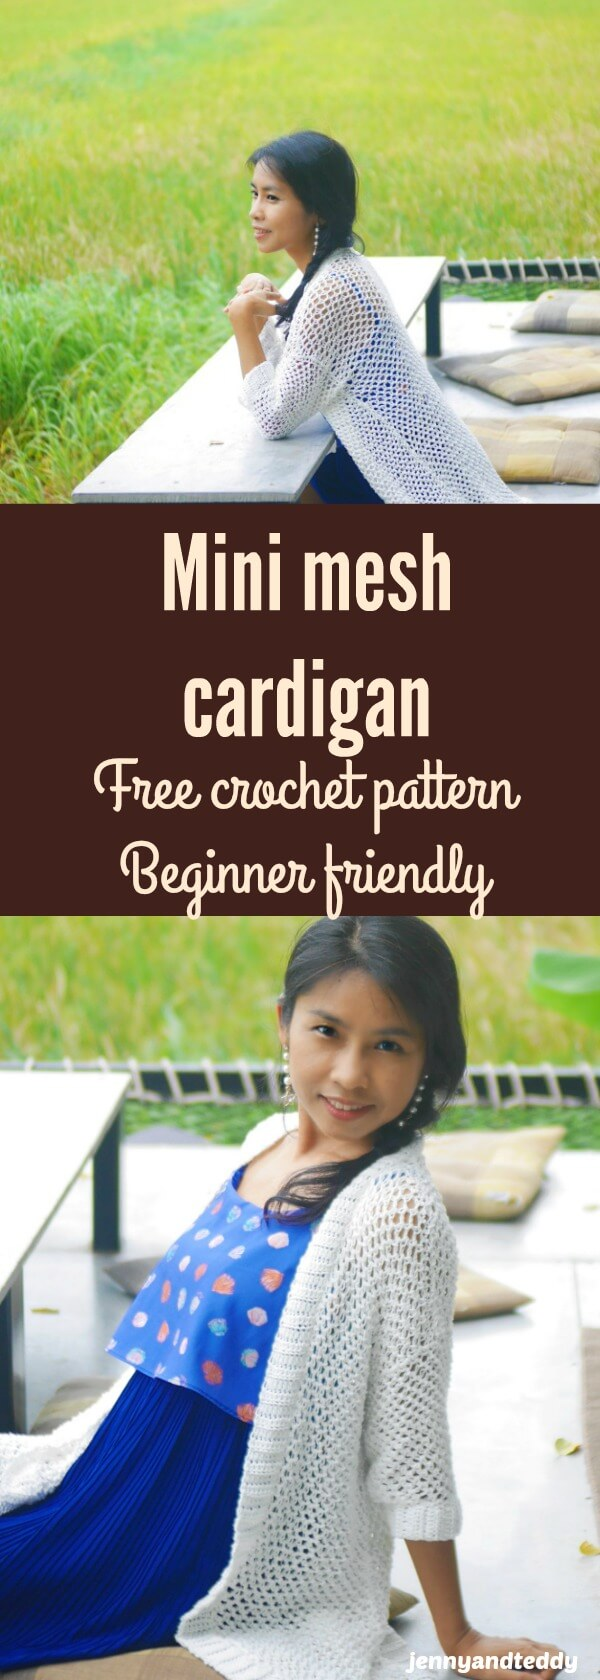 mini mesh cardigan free crochet pattern beginner friendly